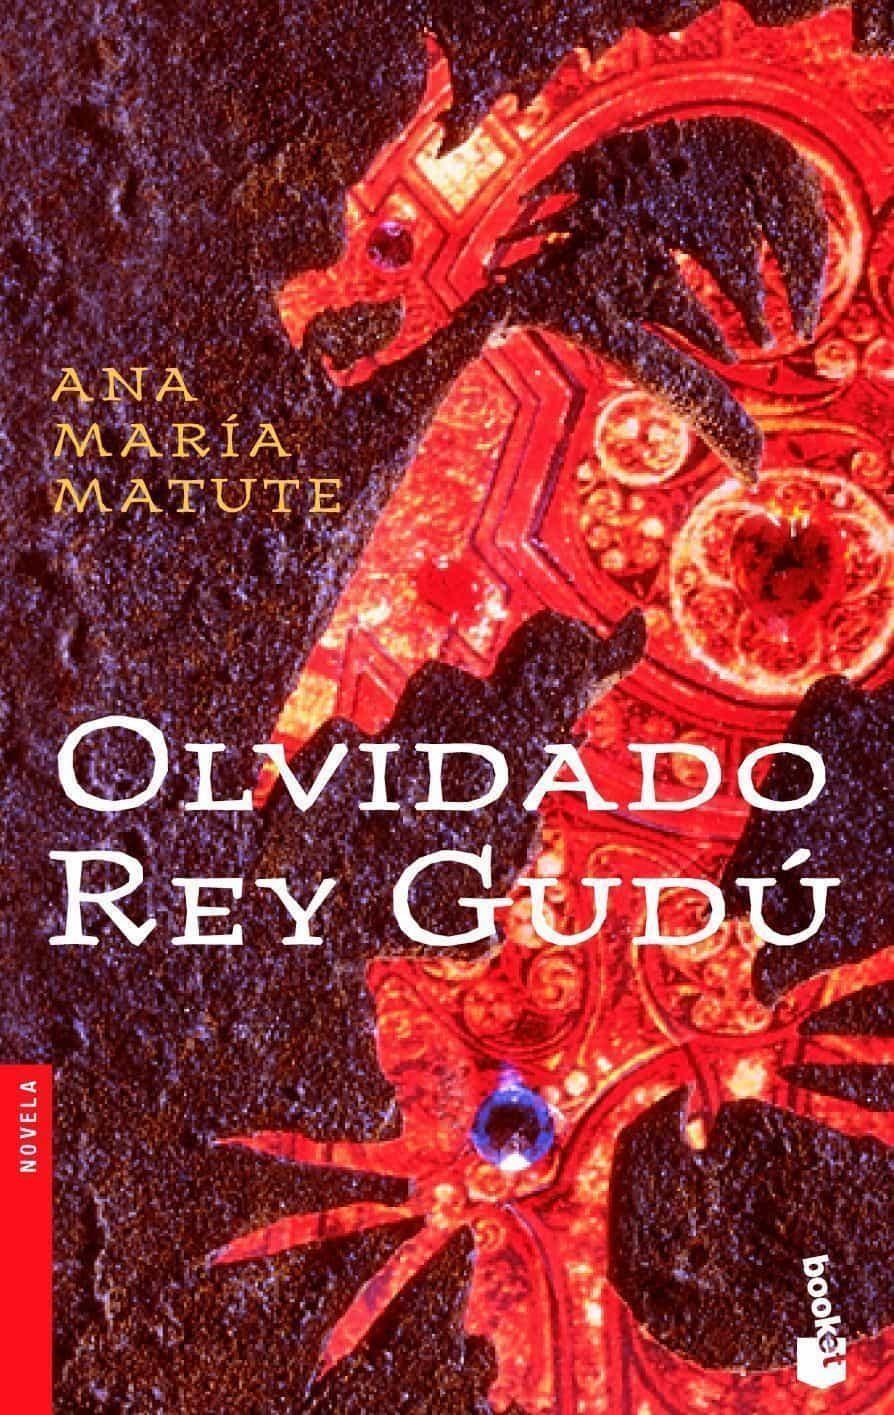 olvidado rey gudu-ana maria matute-9788423338061